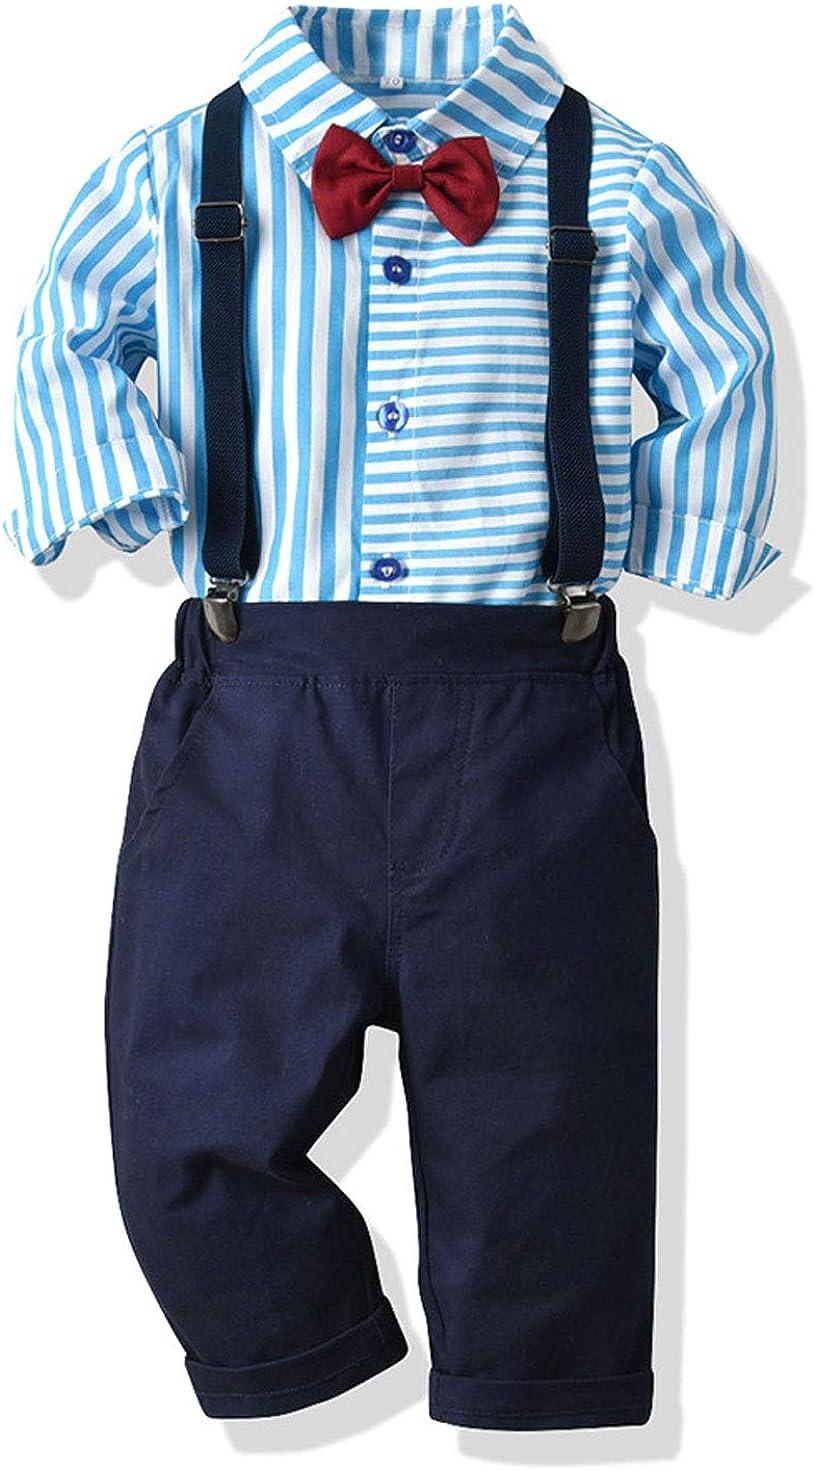 Astellarie Toddler Boys Gentleman Suits 2Pcs Long Sleeve Bowtie Dress Shirt +Suspender Pant Outfit Clothes Set